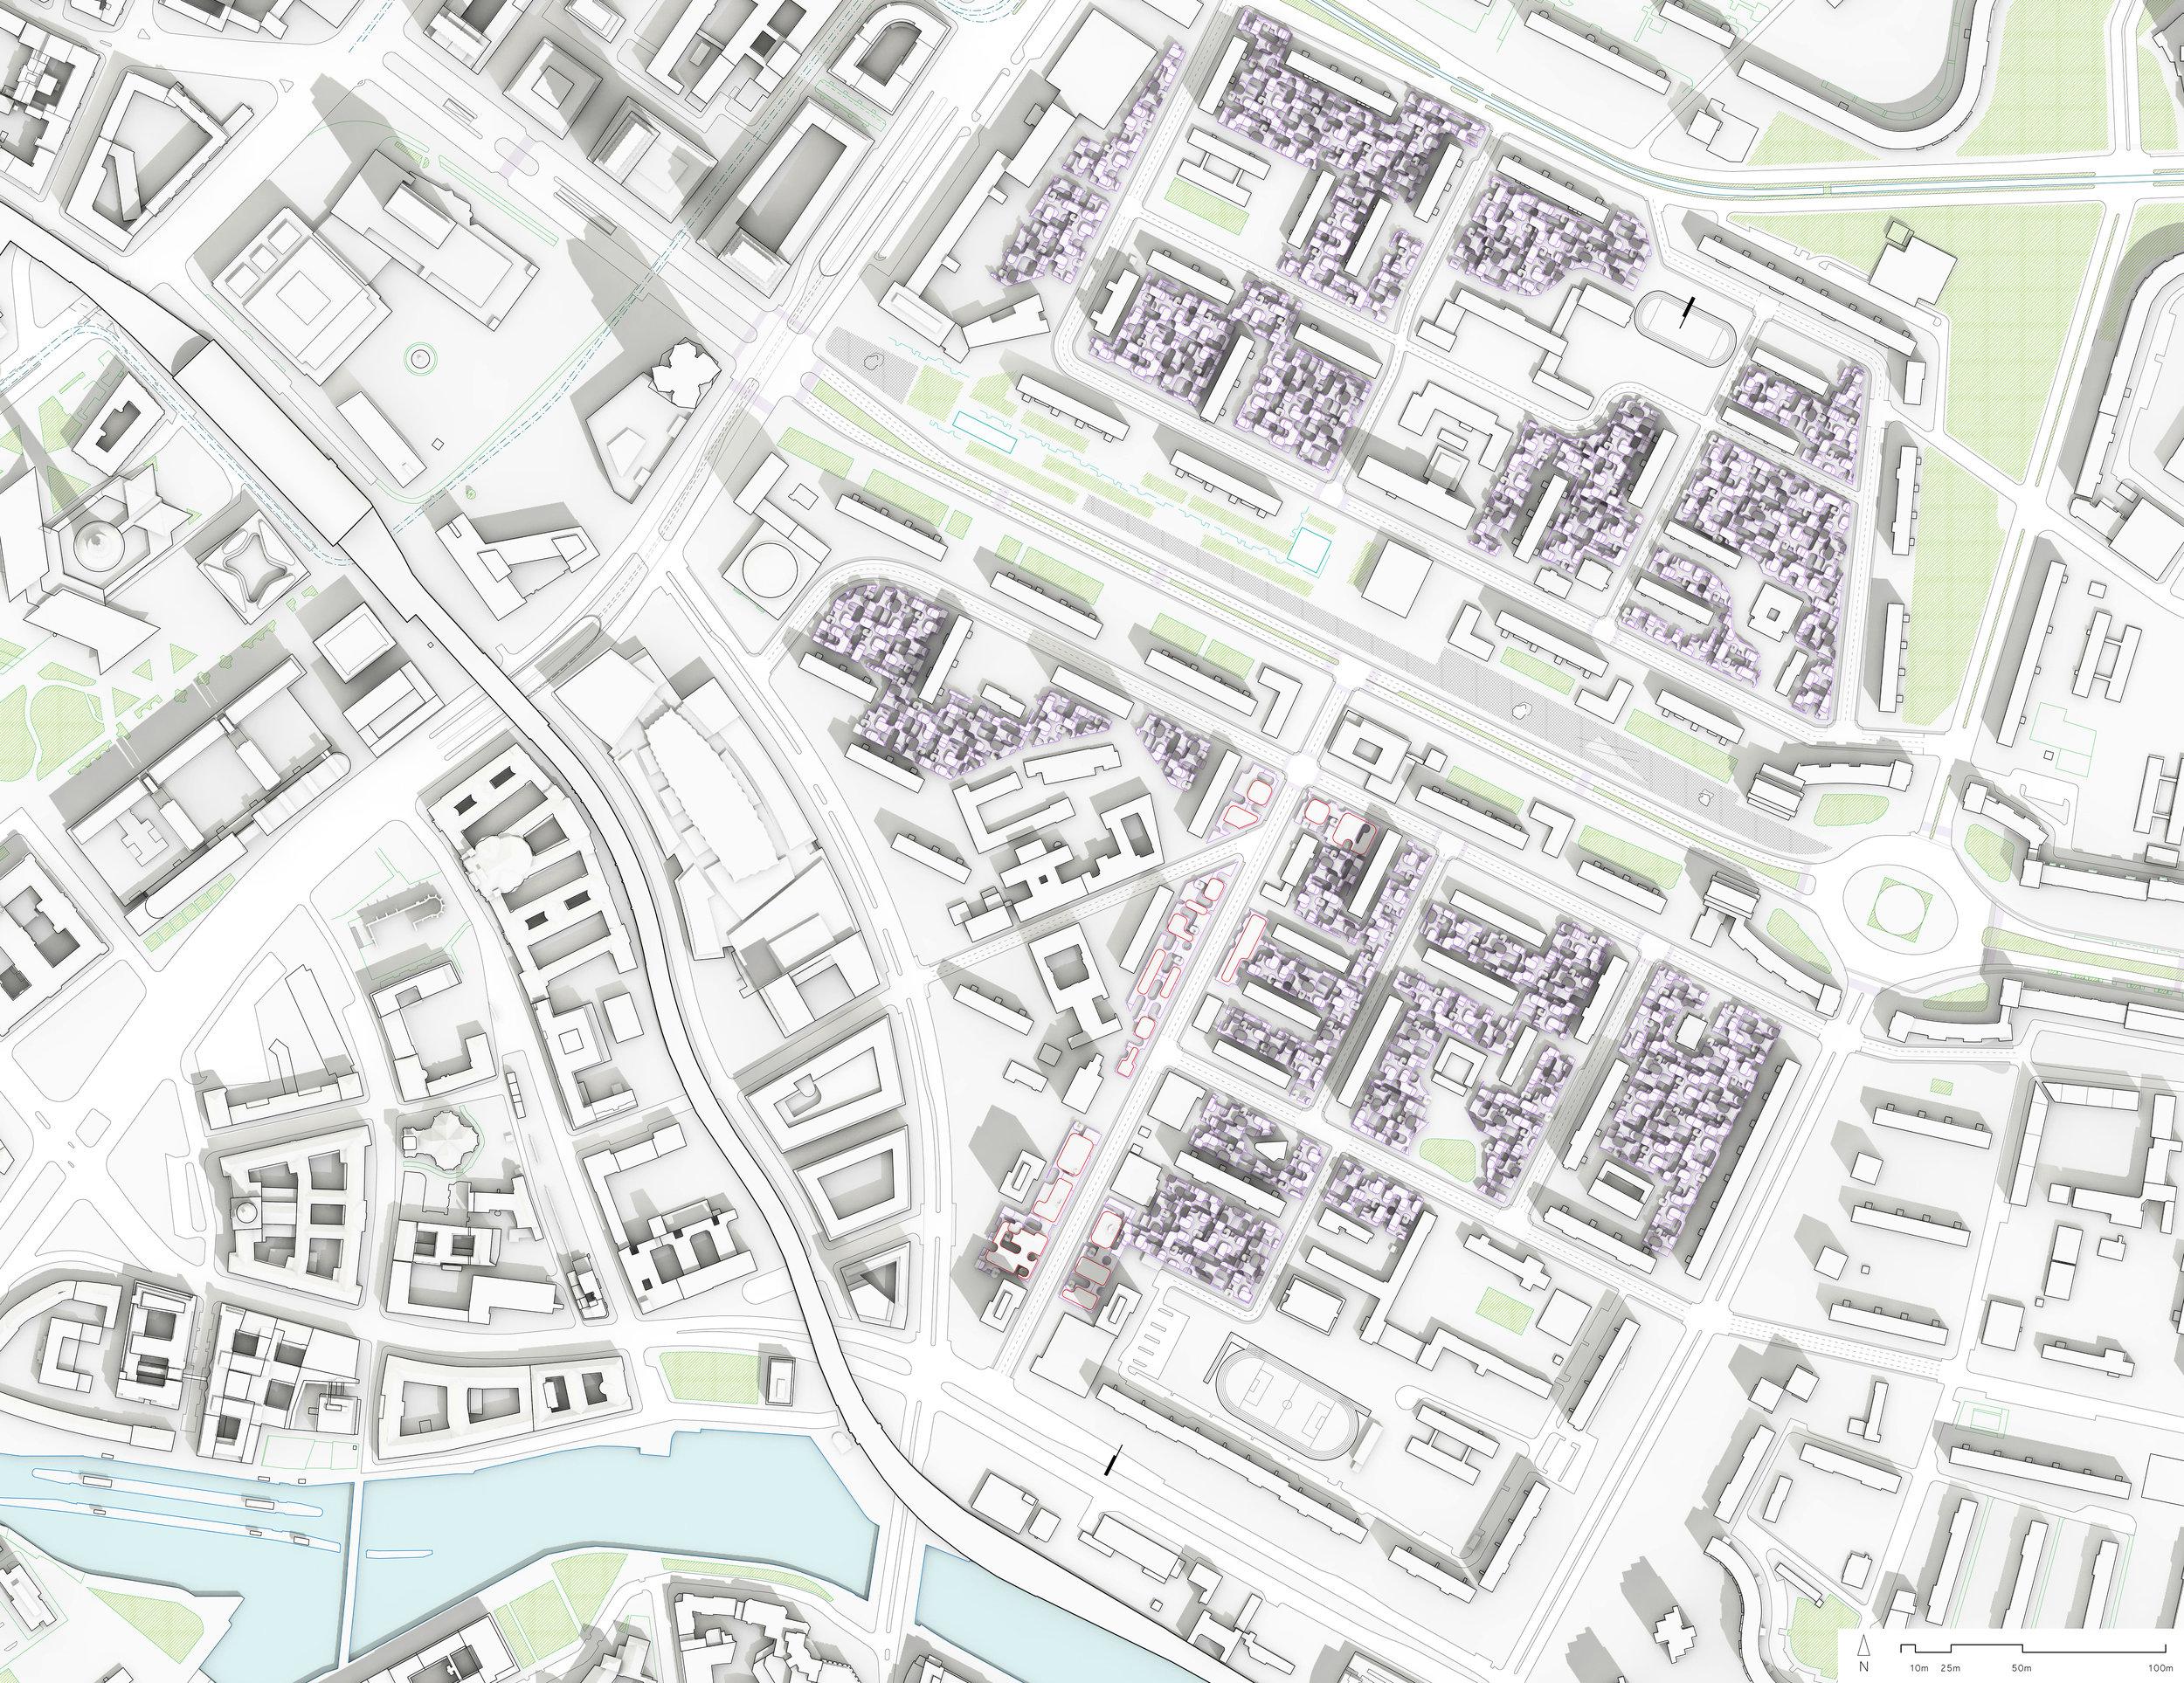 181112 Site Plan Croppedj.jpg